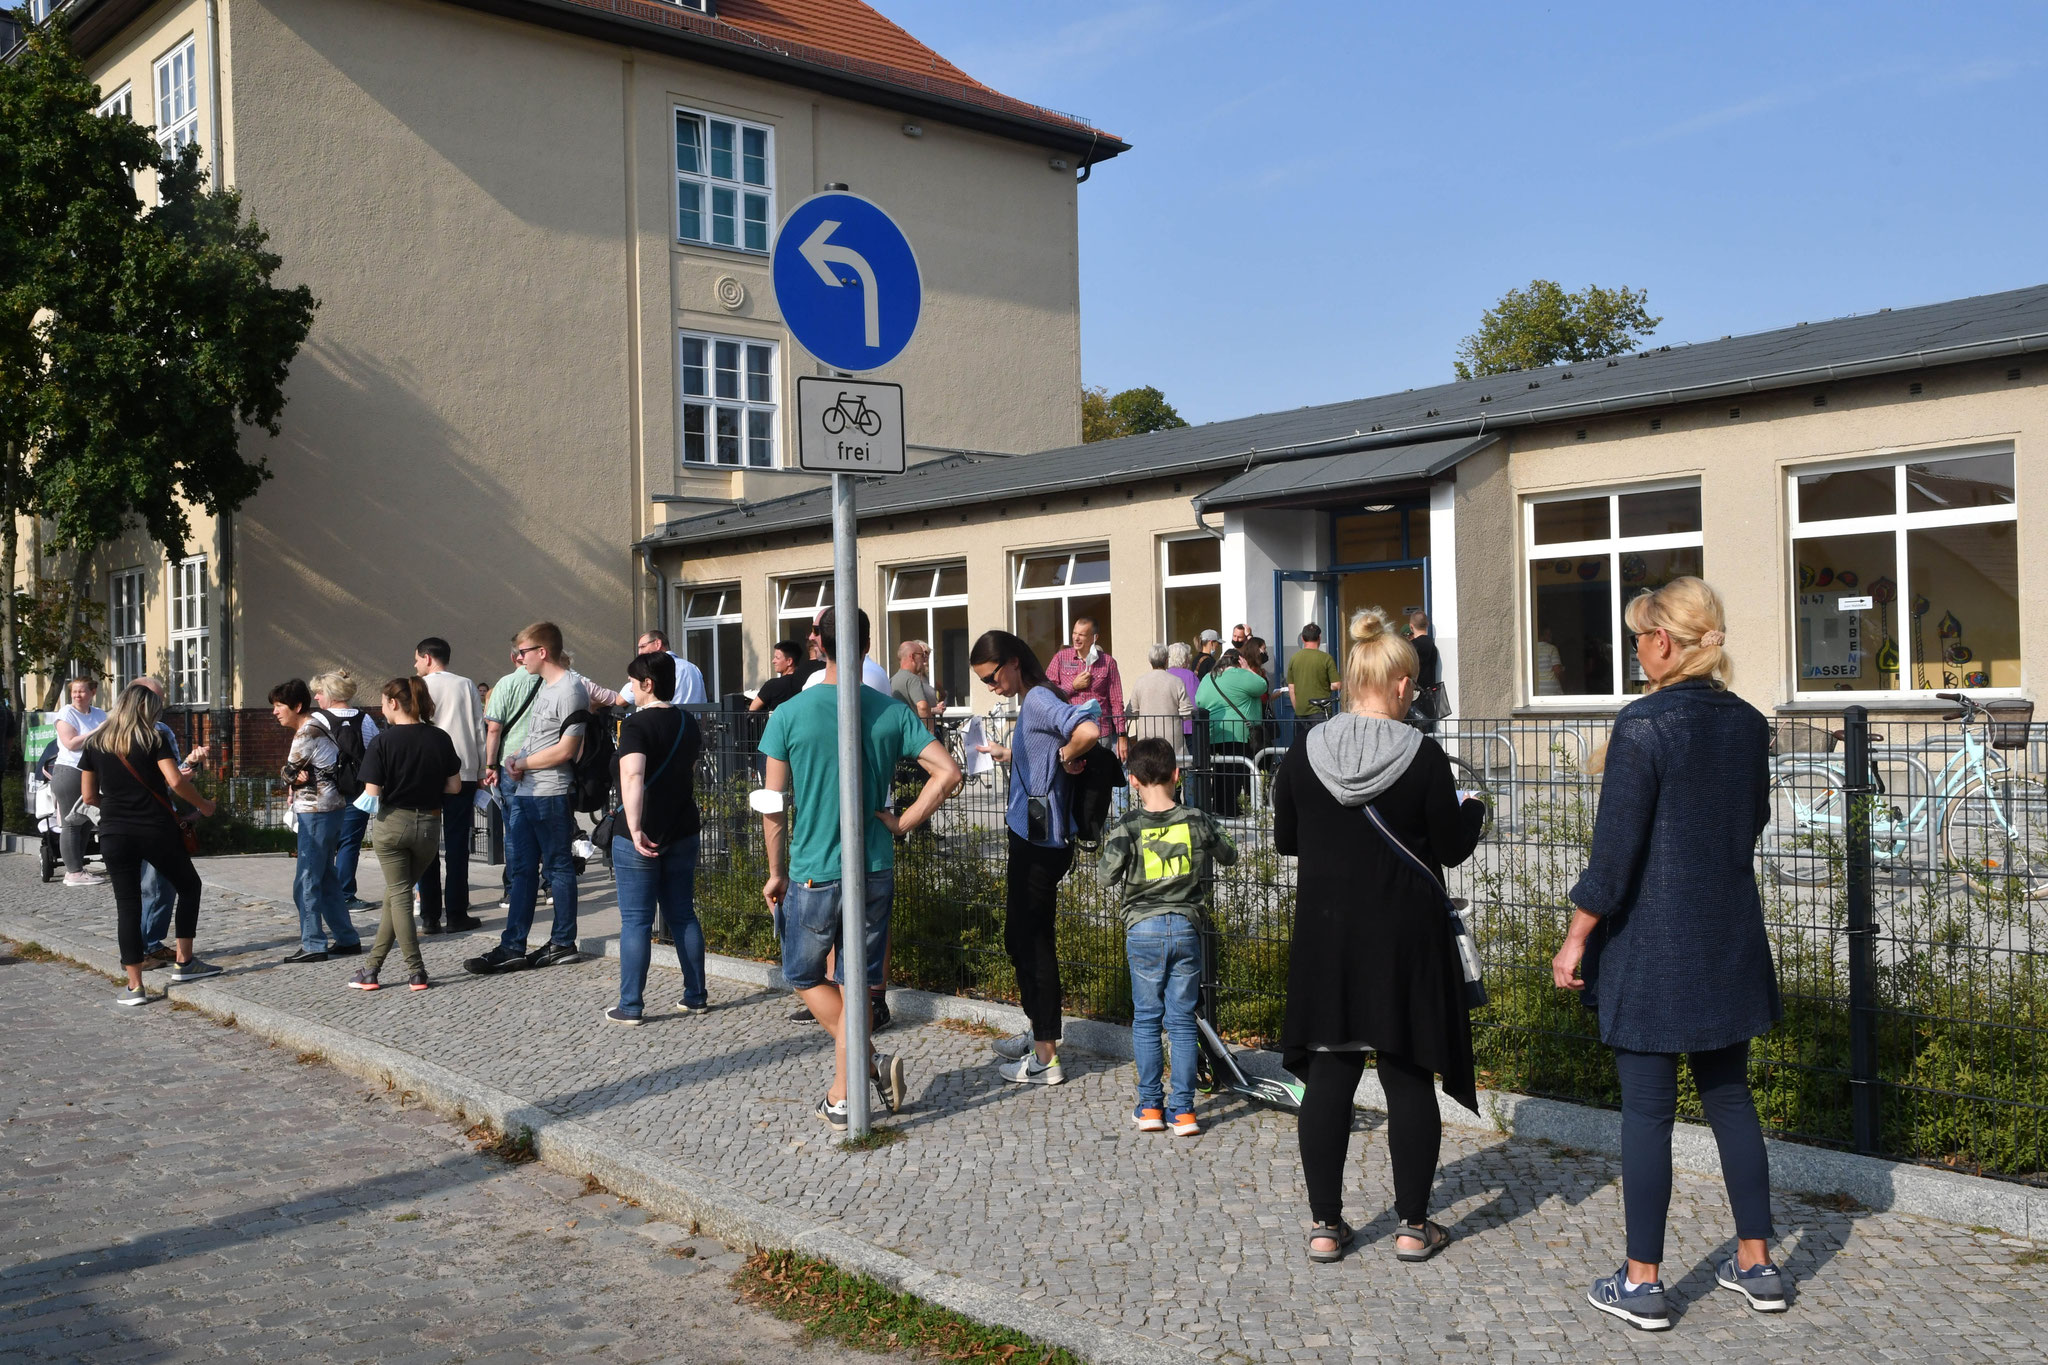 Wahllokal in der Mahlsdorfer Grundschule © pressefoto-uhlemann.de